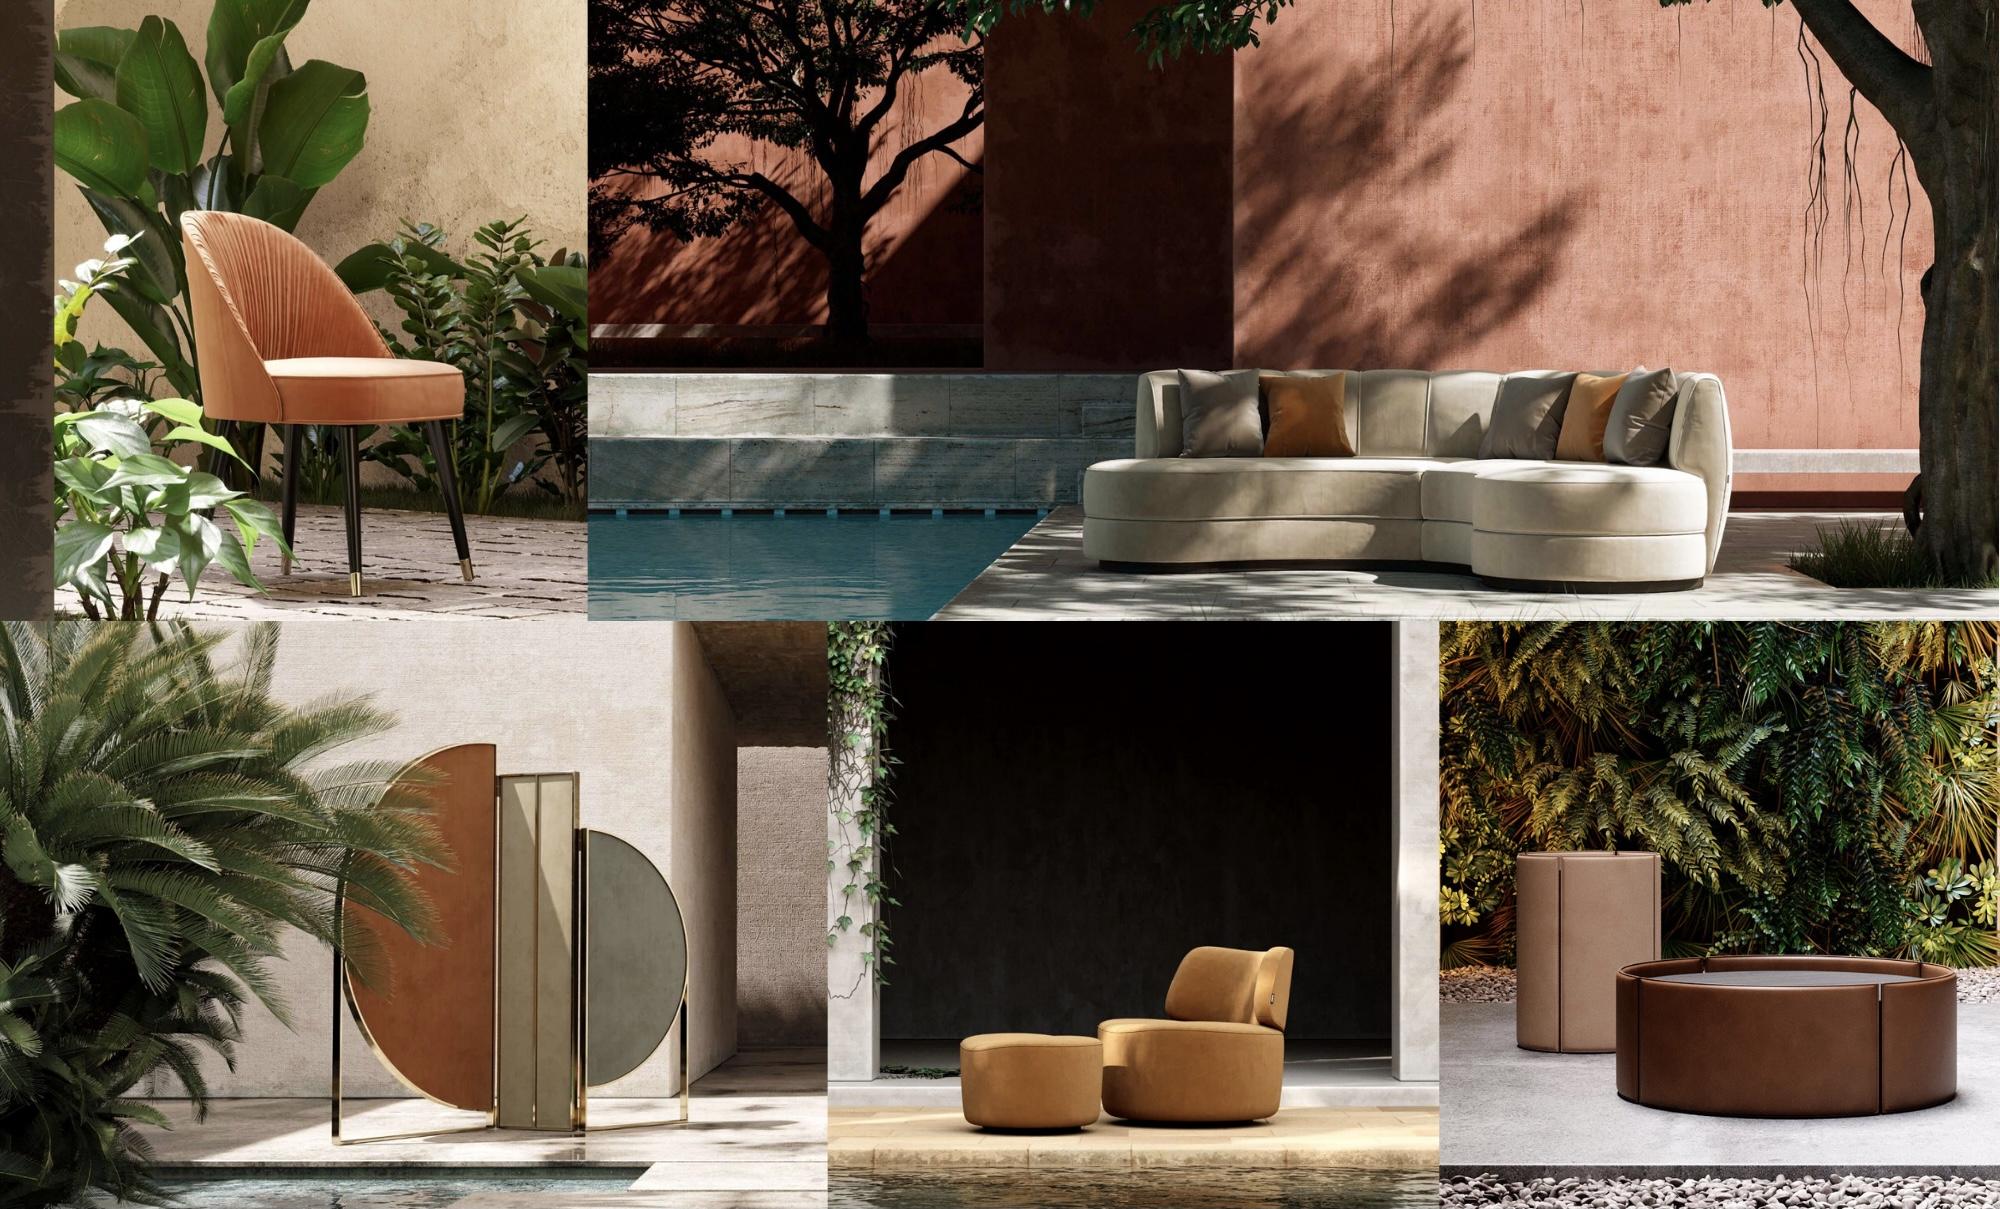 Domkapa outdoor design with contemporary pieces